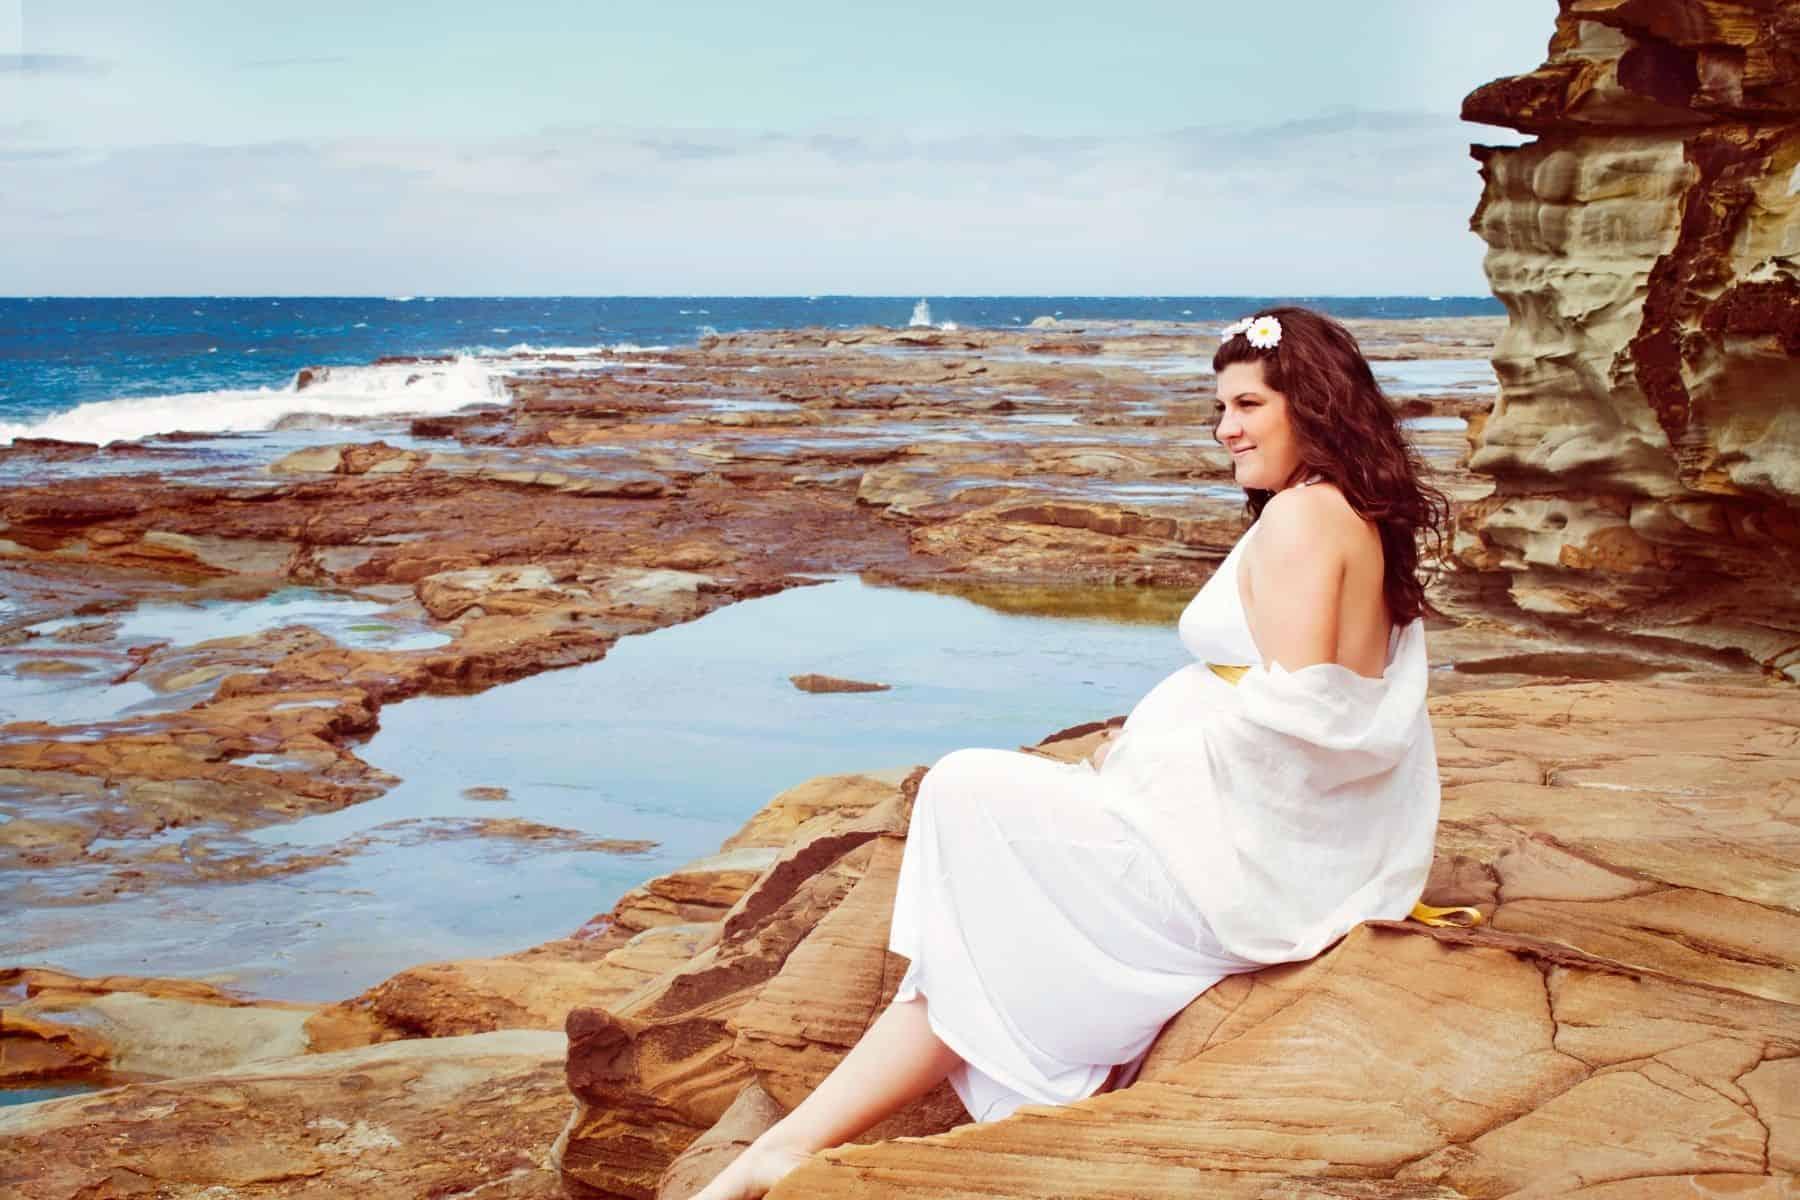 seaside maternity shoot photo